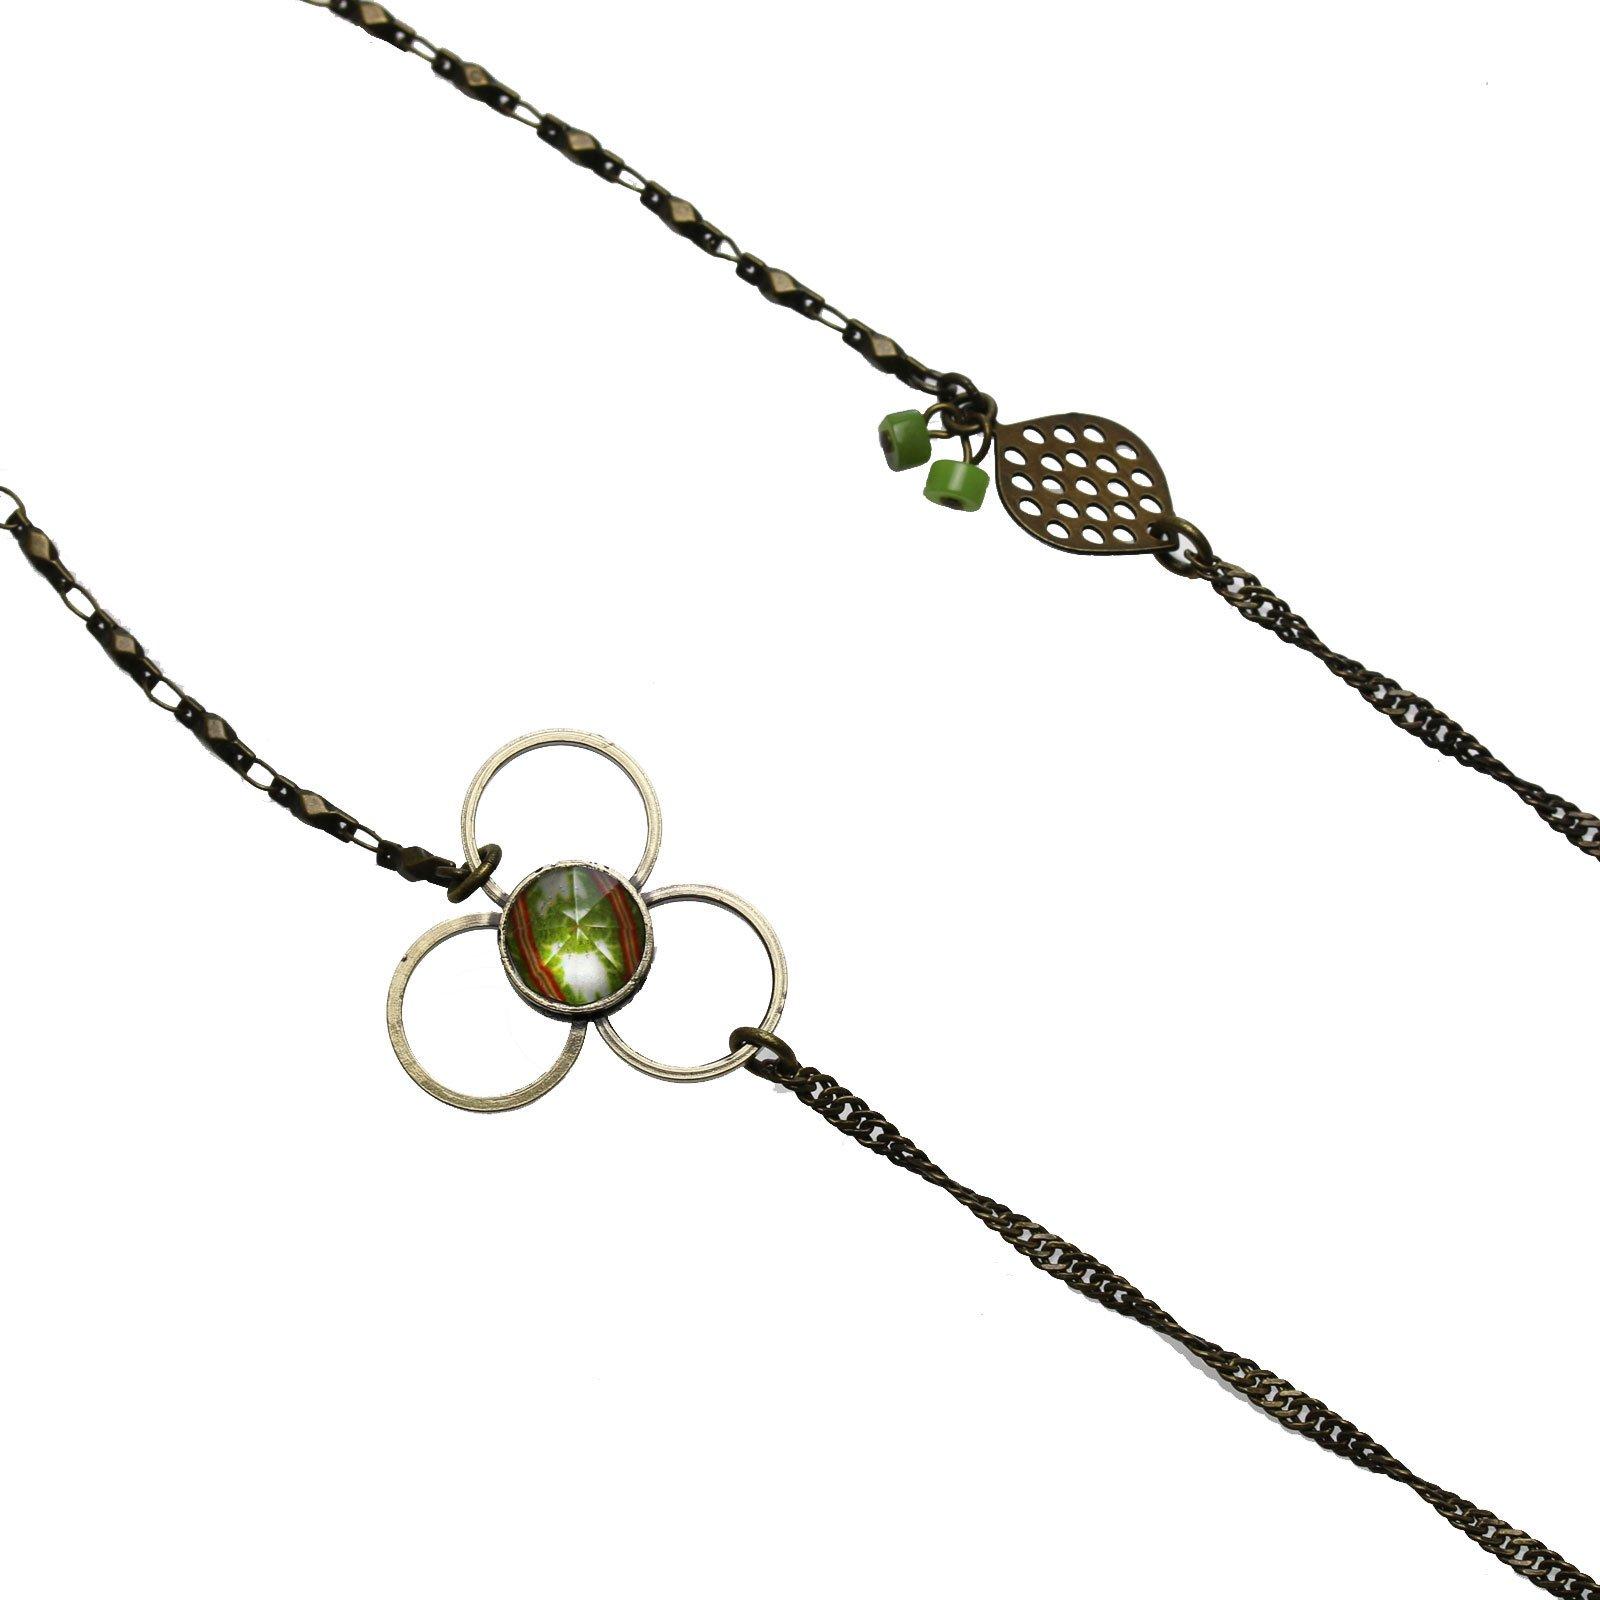 Tamarusan Glasses Chain Cicada Green Plainite Unisex Glass Code by TAMARUSAN